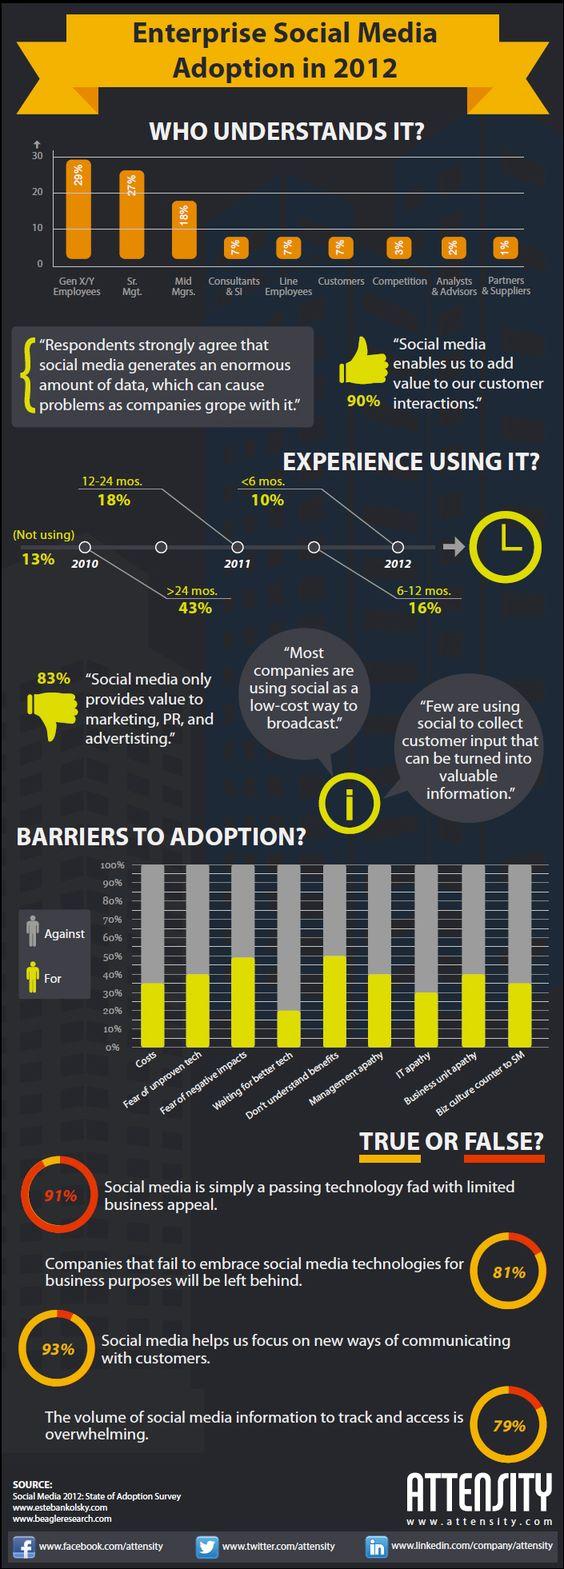 Enterprise social media adoption in 2012